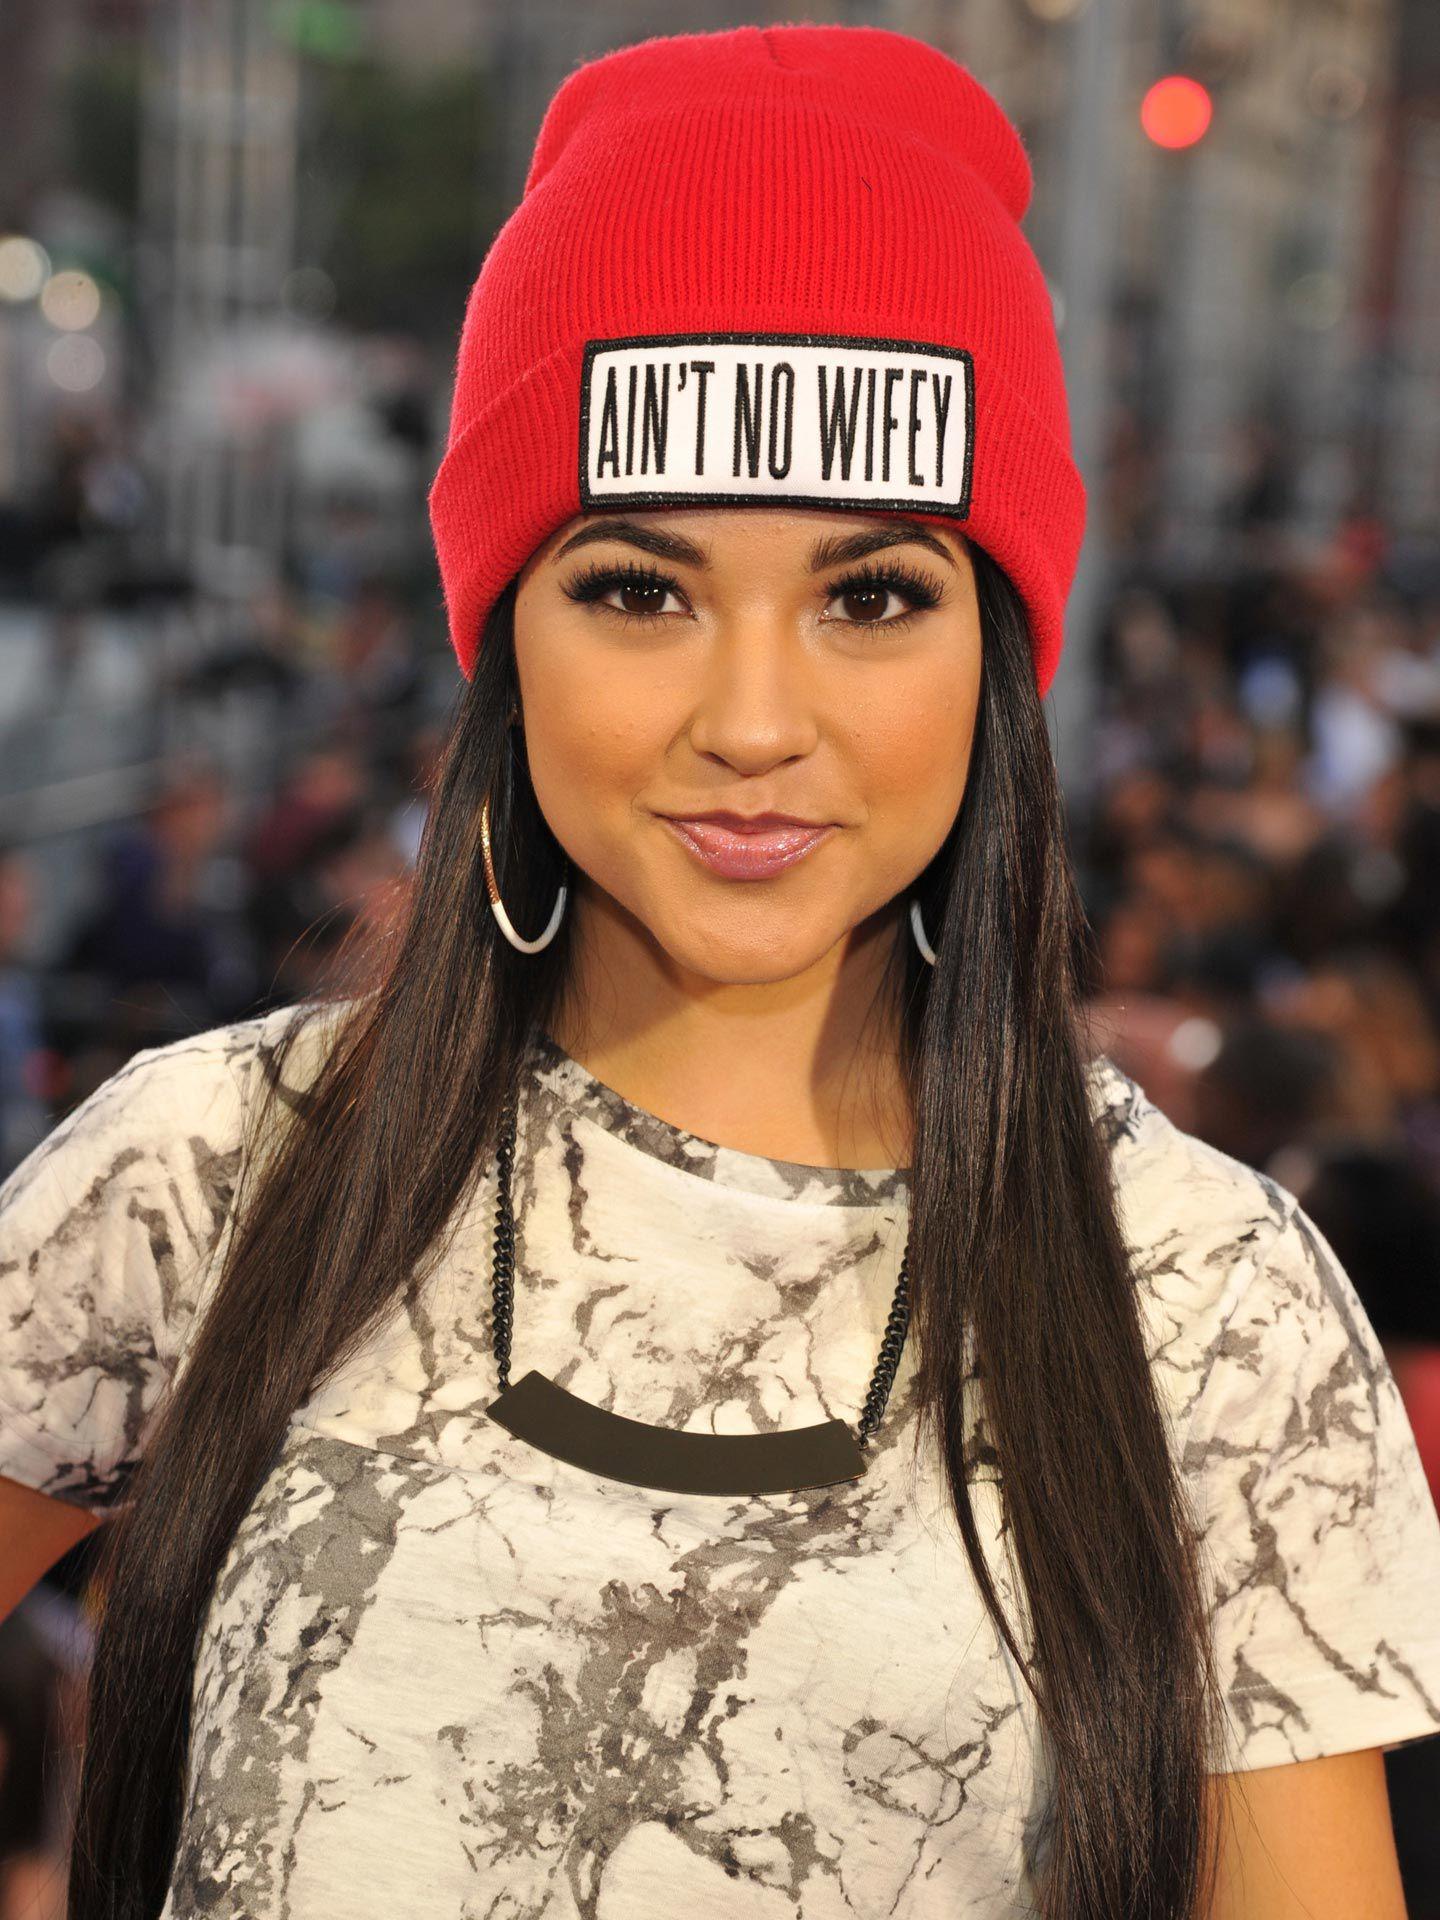 Celebrities Wearing Hats - Hat Trends for Women